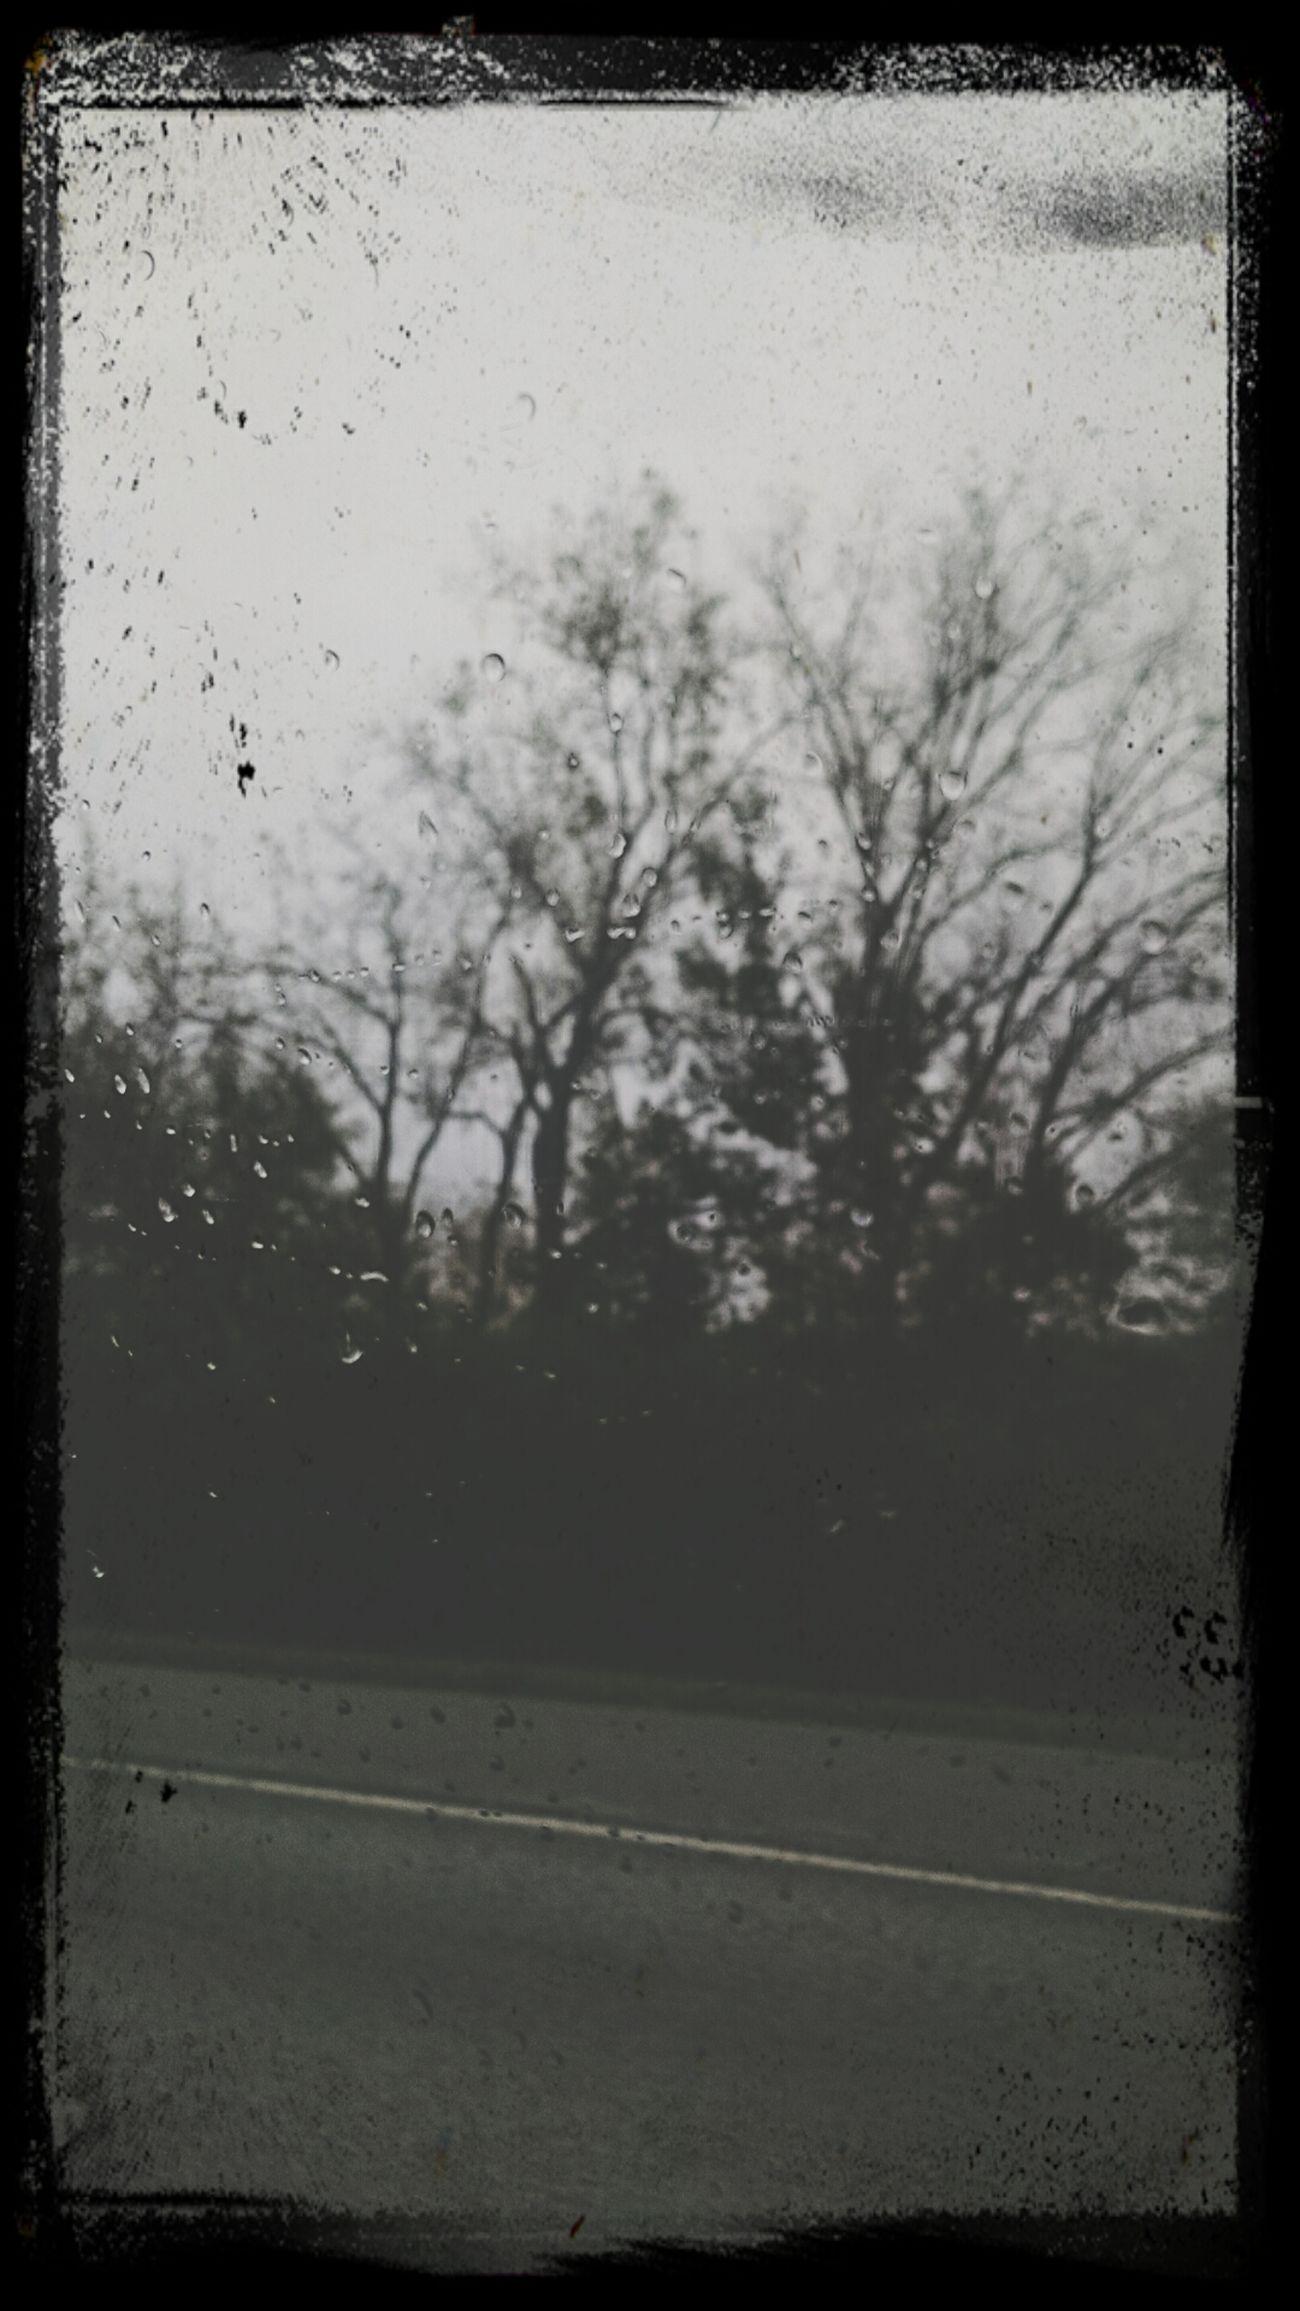 Rainy days are perfect.❤ Rainy Days Raindrops Window CarRides